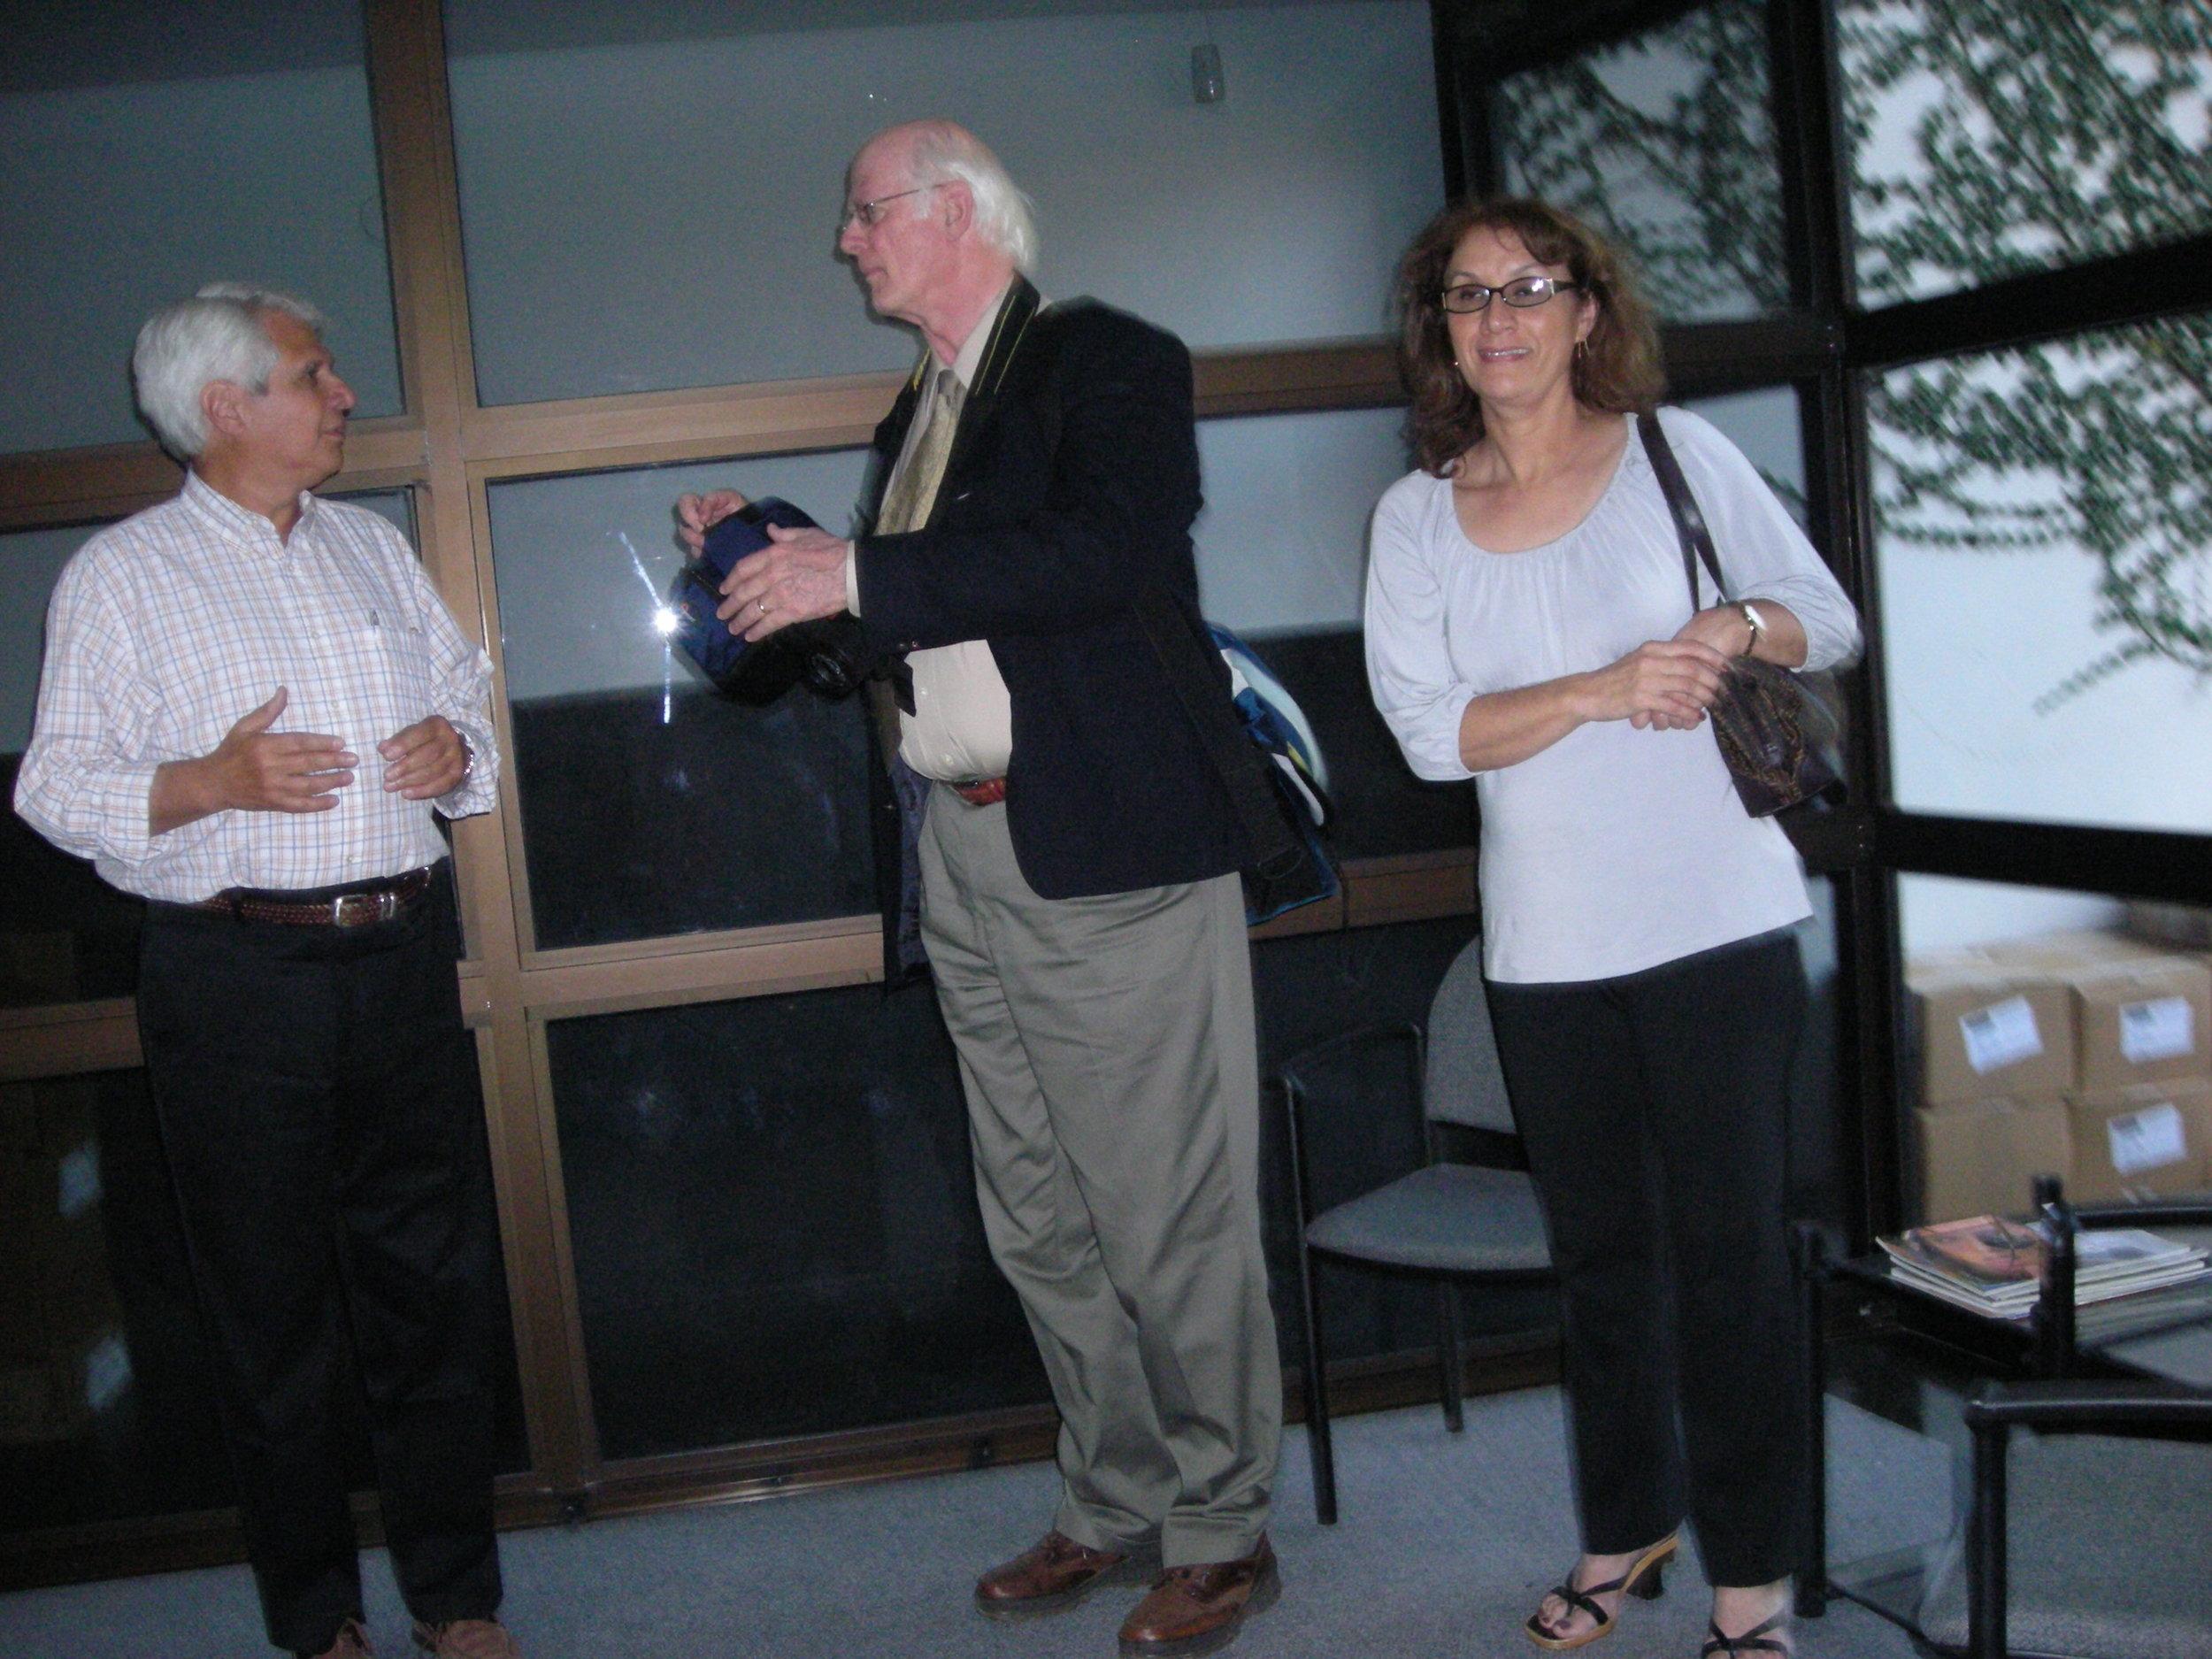 Project C.U.R.E. assessment at Dr. Antonio Cubilla's Pathology Clinic by Mr. R. White and Fundacion Panambi volunteer, Mrs. Susana Duarte